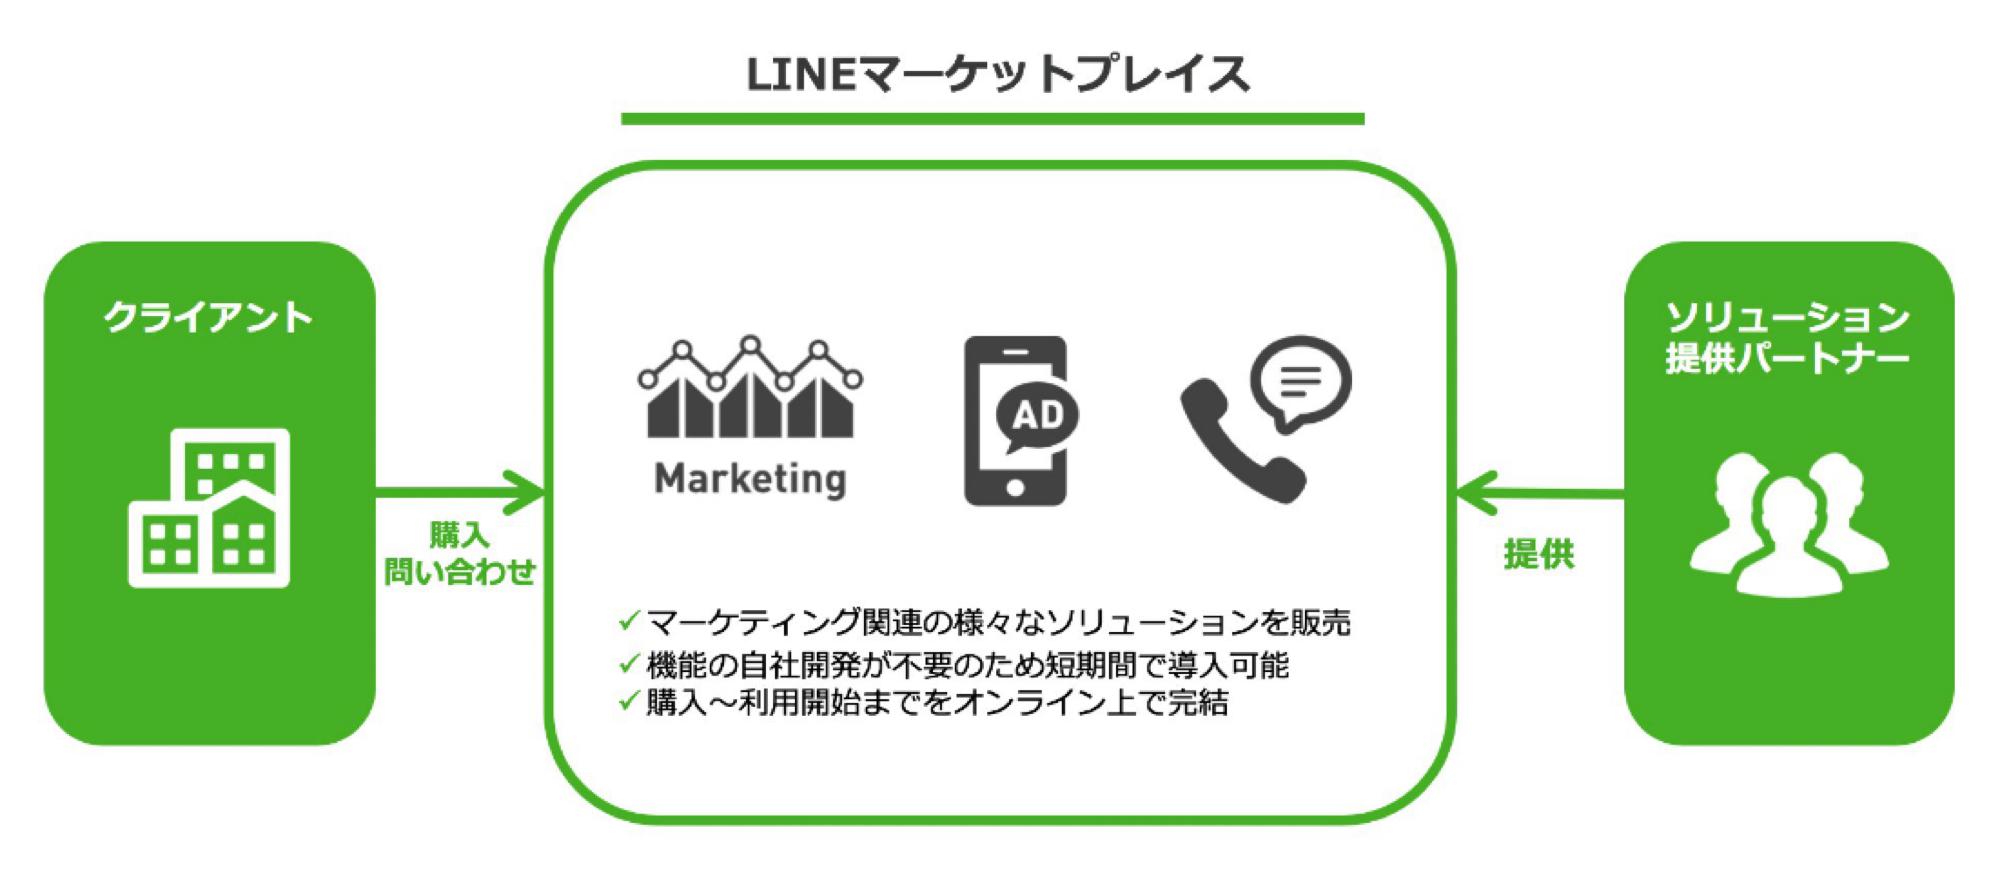 LINEマーケットプレイス